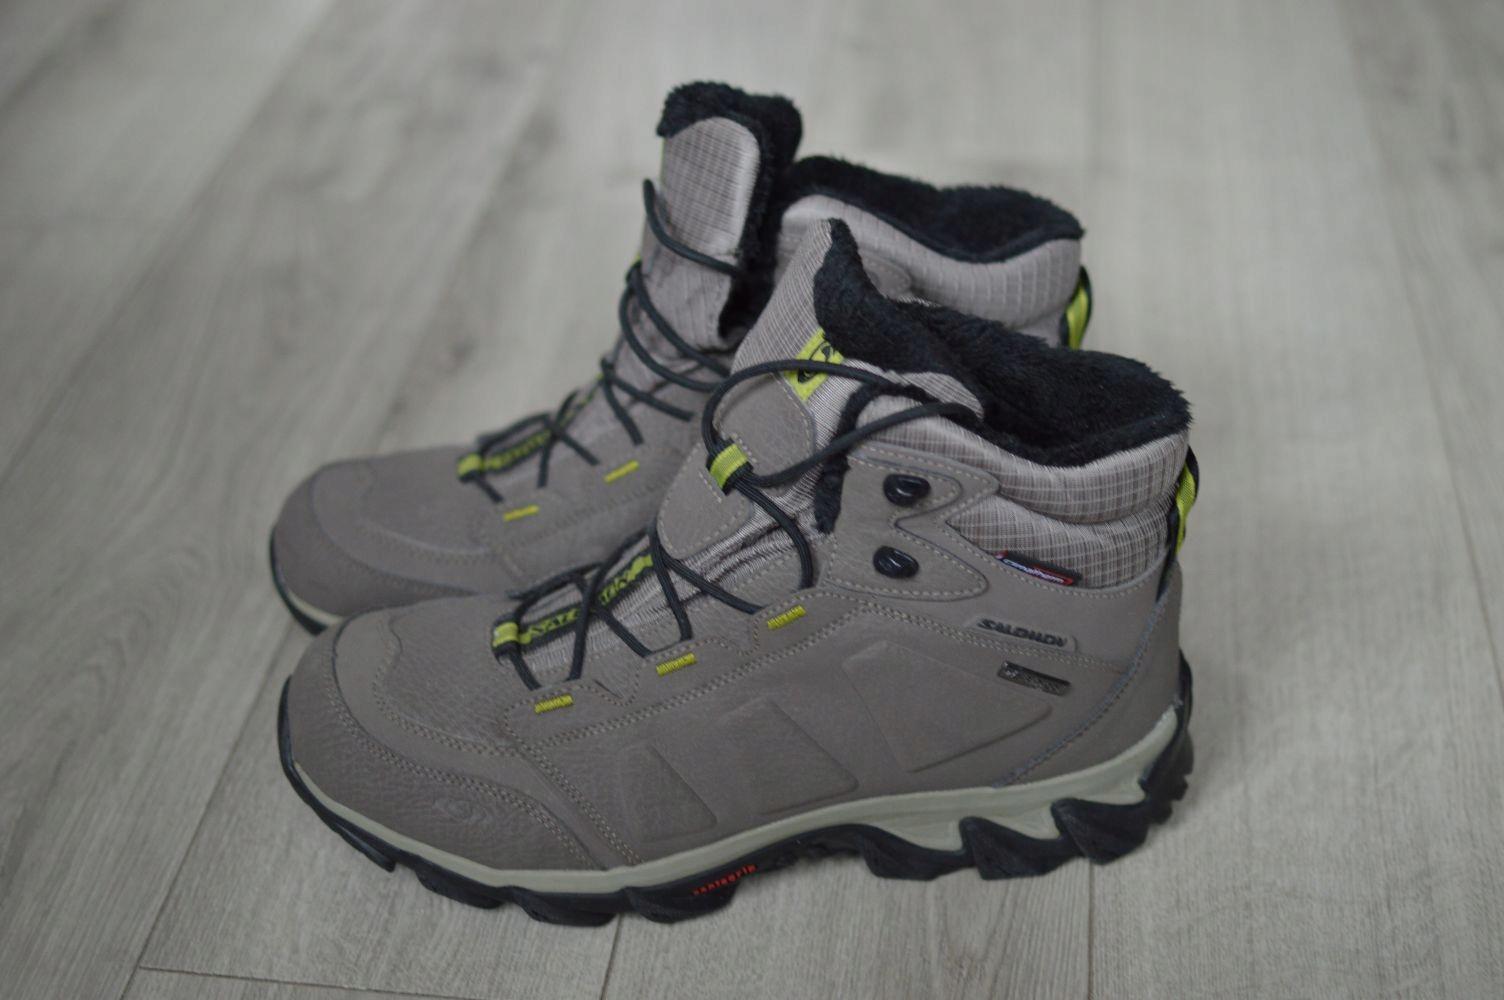 Zimowe buty trekkingowe Salomon Elbrus WP r. 46